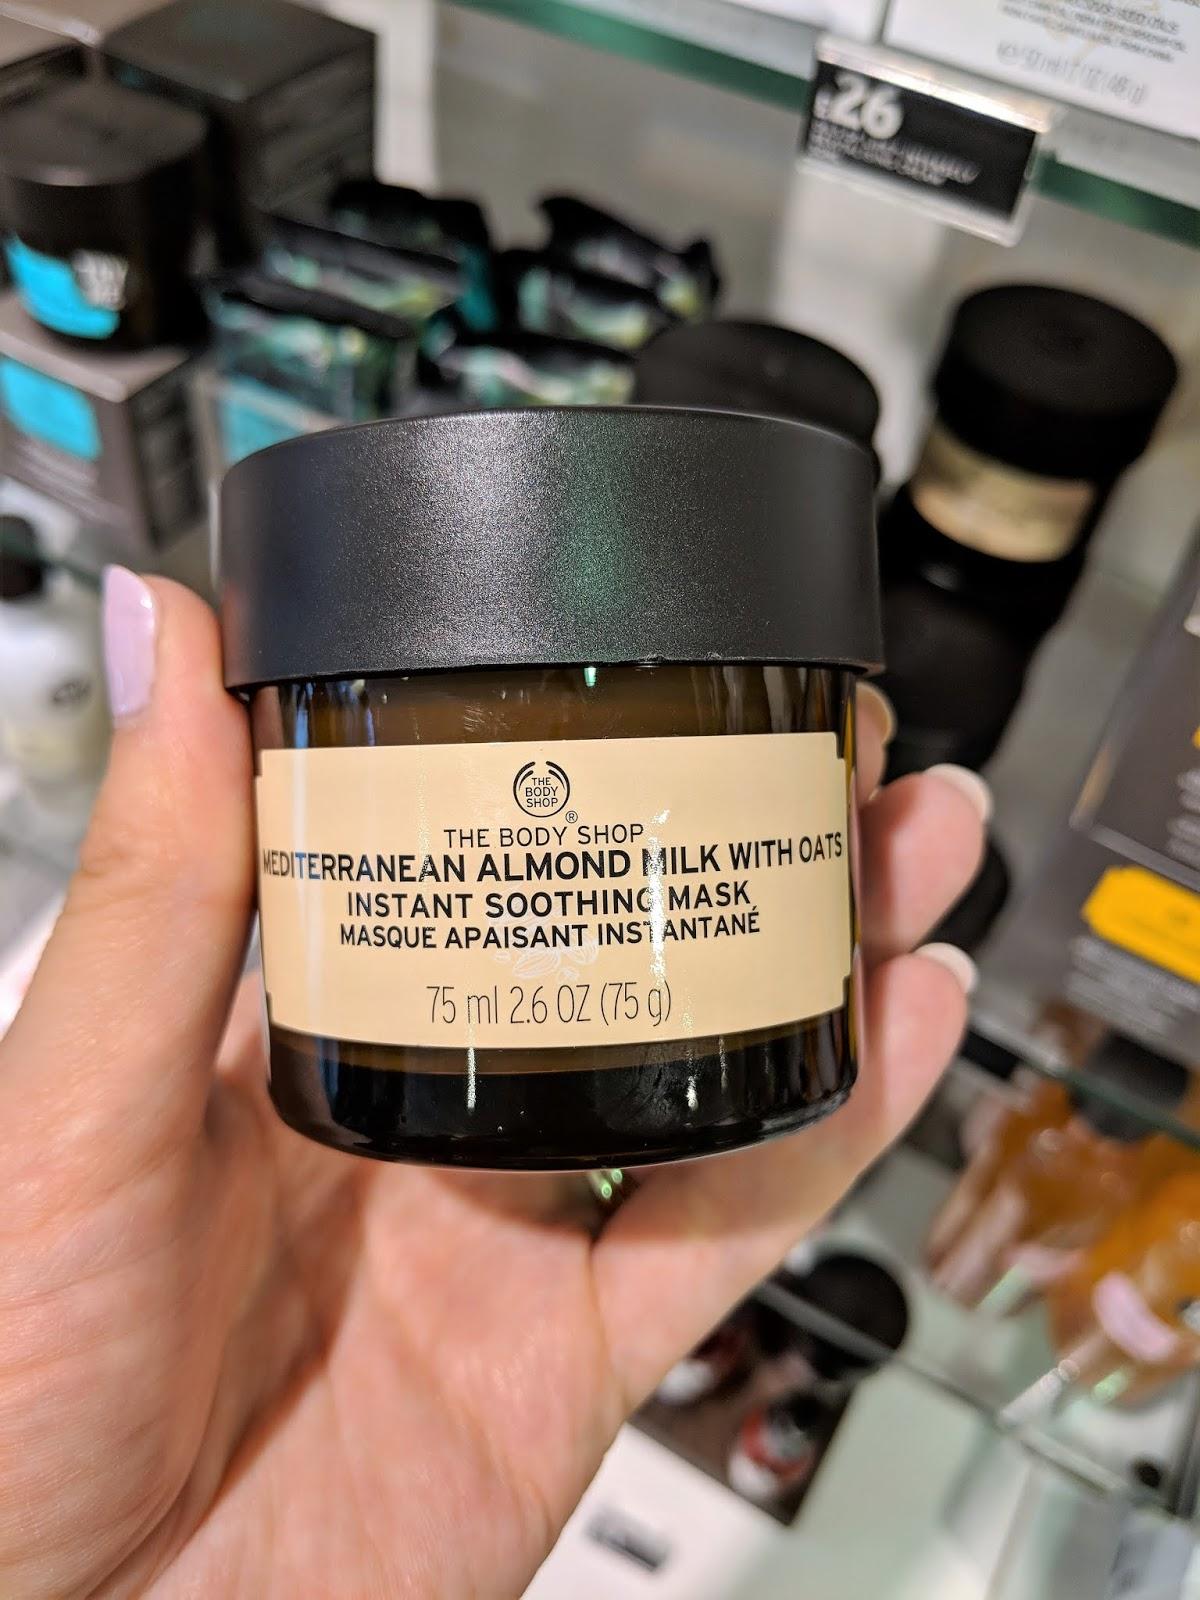 The_Body_Shop_Mediterranean_Almond_Oats_Face_Mask